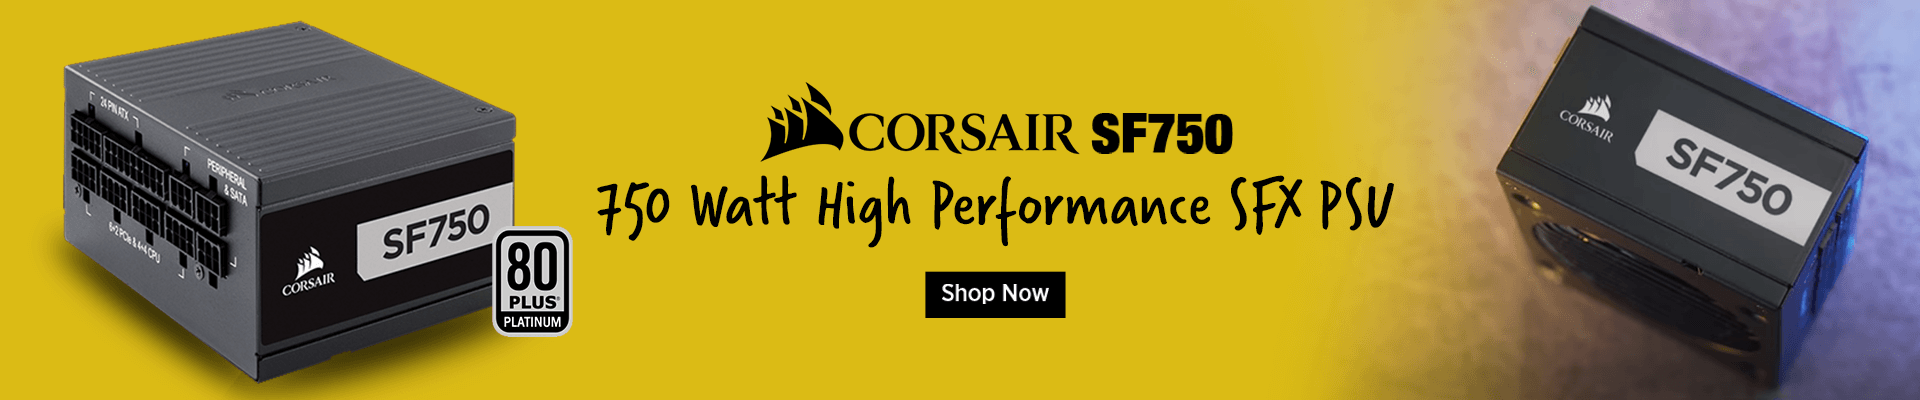 CORSAIR SF750 80 Plus Platinum Fully Modular